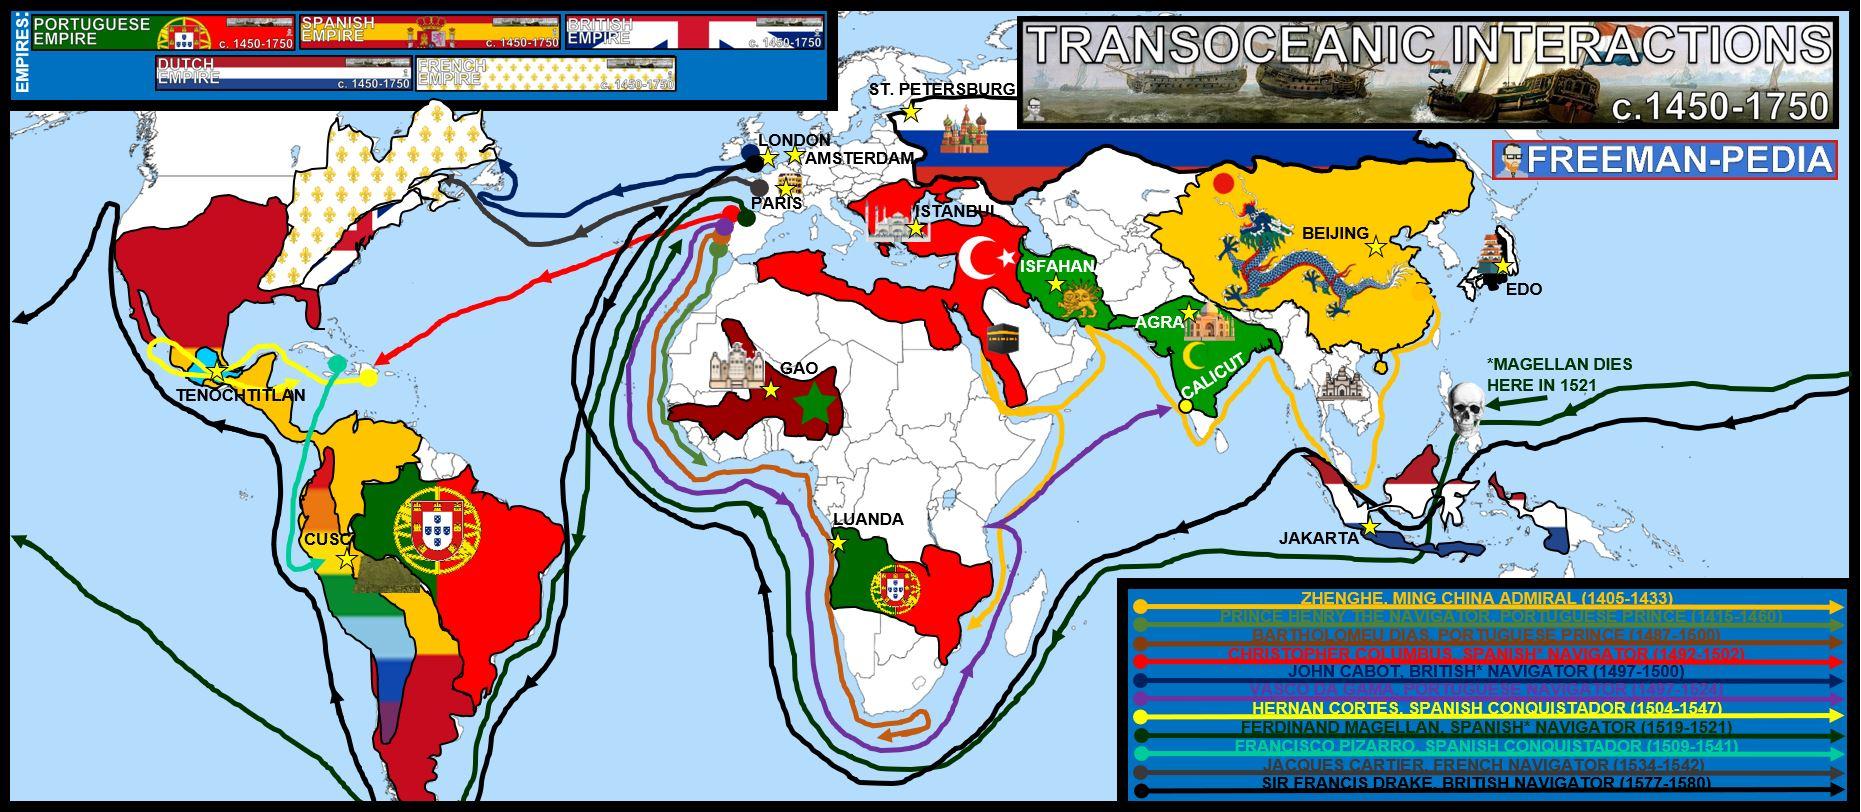 TRANSOCEANIC INTERACTIONS MAP FREEMANPEDIA AP WORLD MODERN.JPG